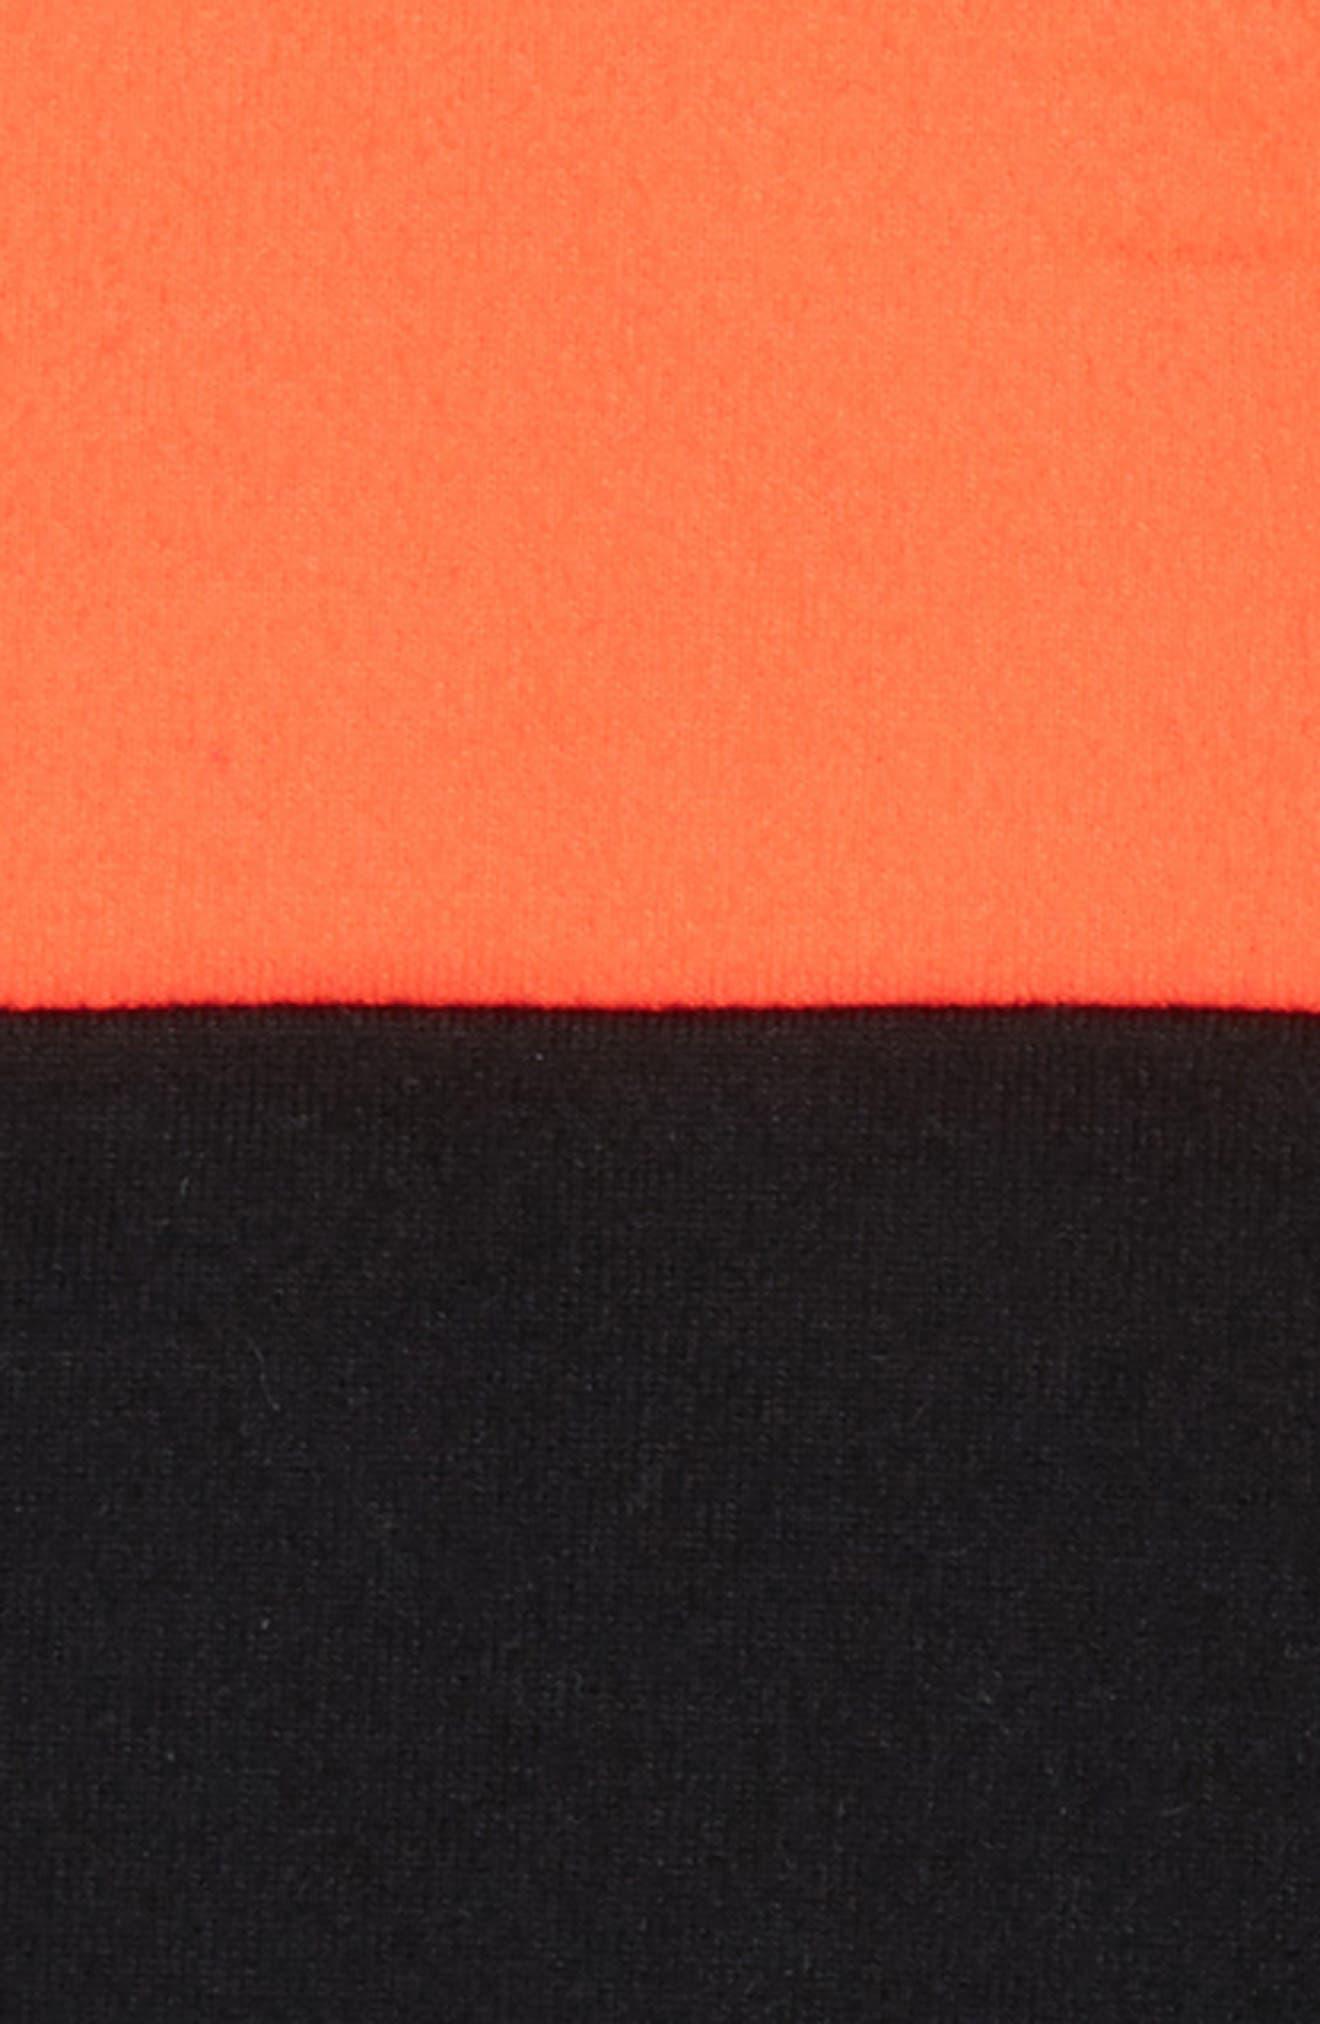 Colorblock Sports Bra,                             Alternate thumbnail 2, color,                             Black- Coral